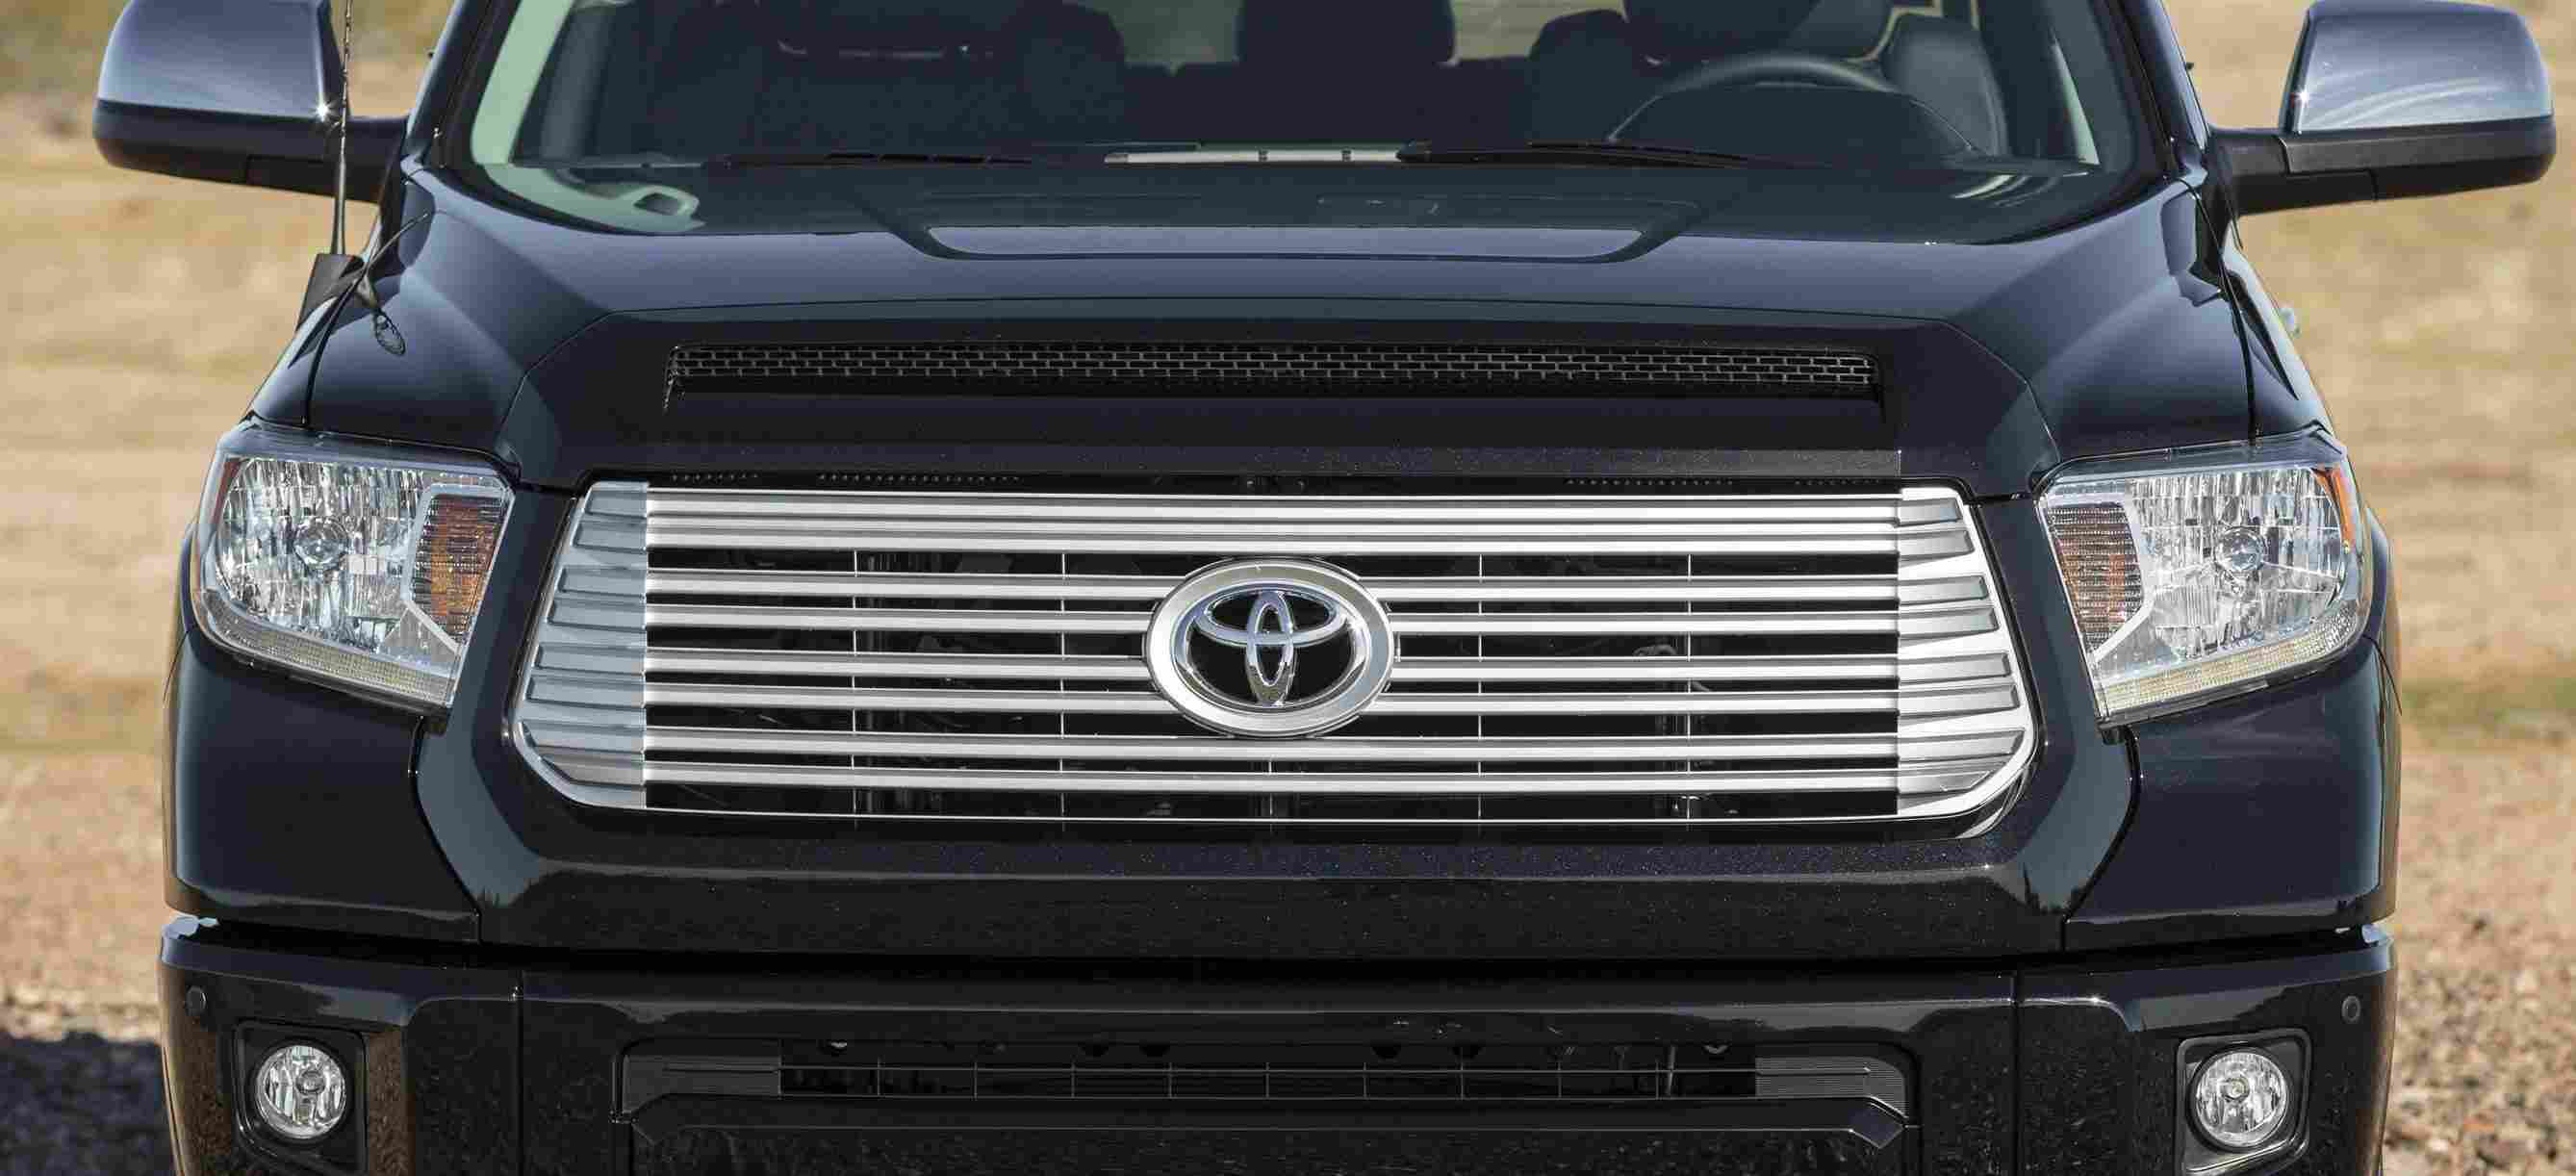 Toyota Dealerships In Michigan Upcomingcarshq Com